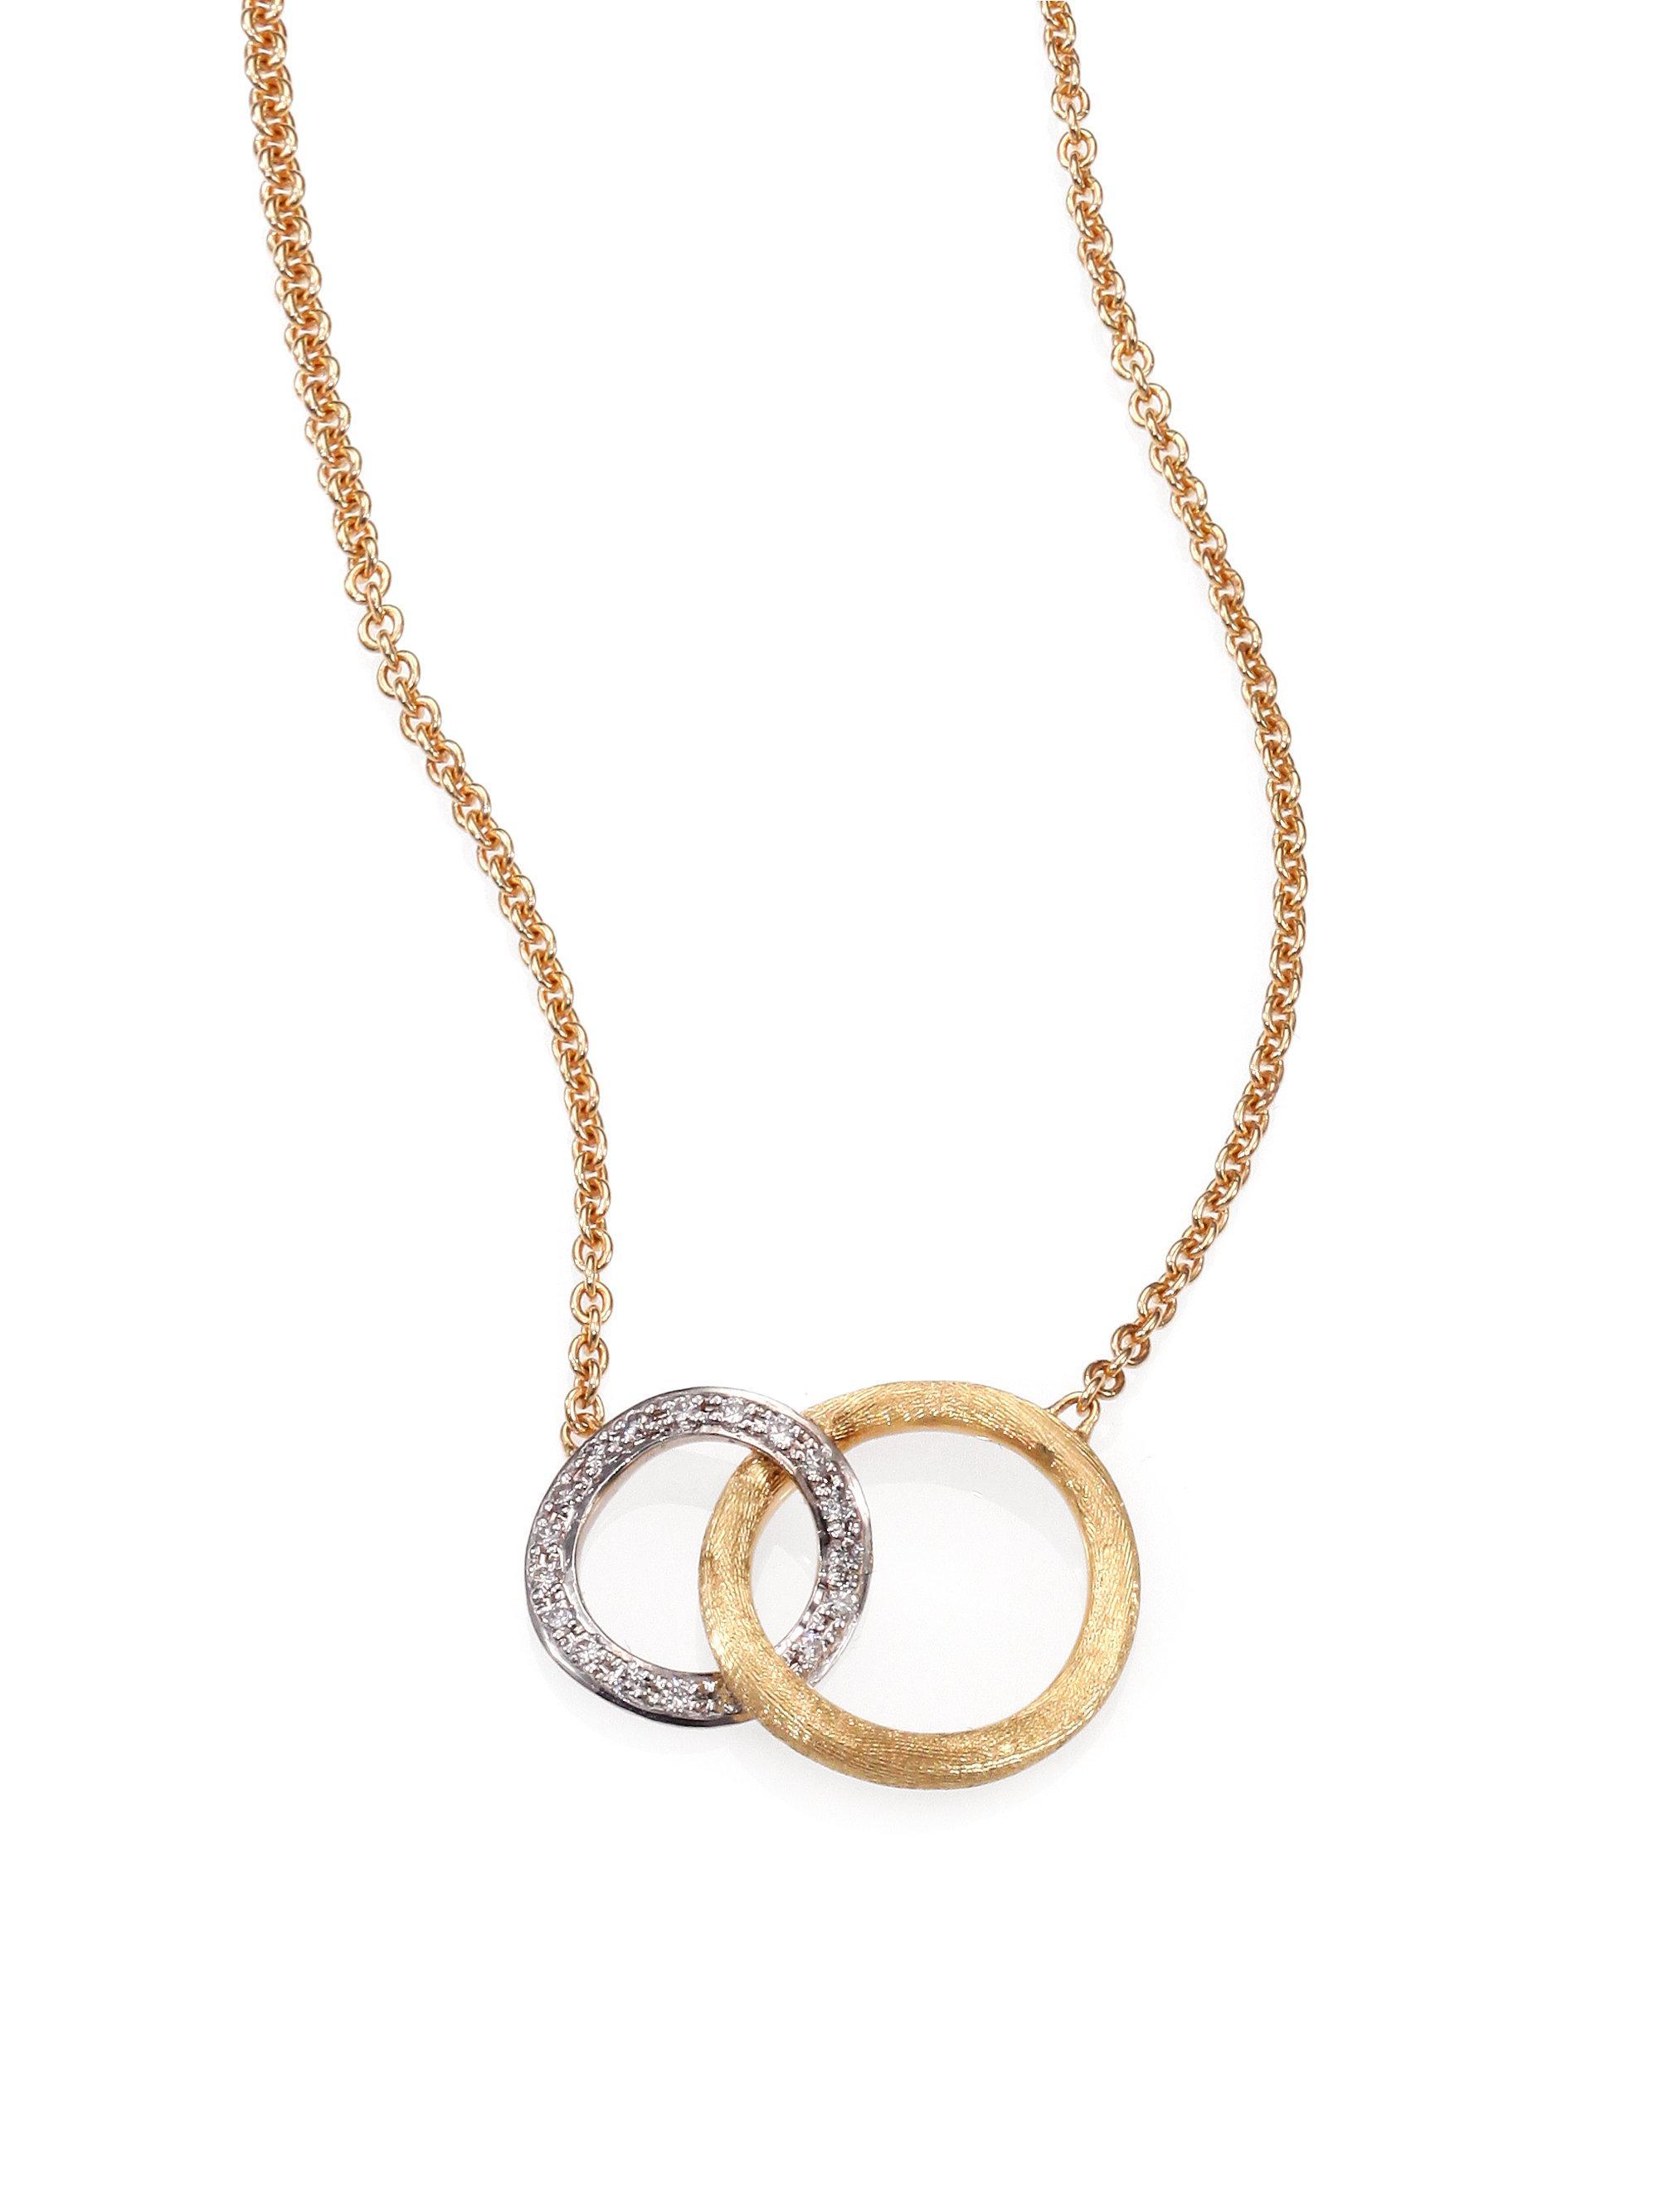 Marco Bicego 18k Jaipur Statement Collar Necklace w/ Blue Topaz & Diamonds Rd8owjyGv